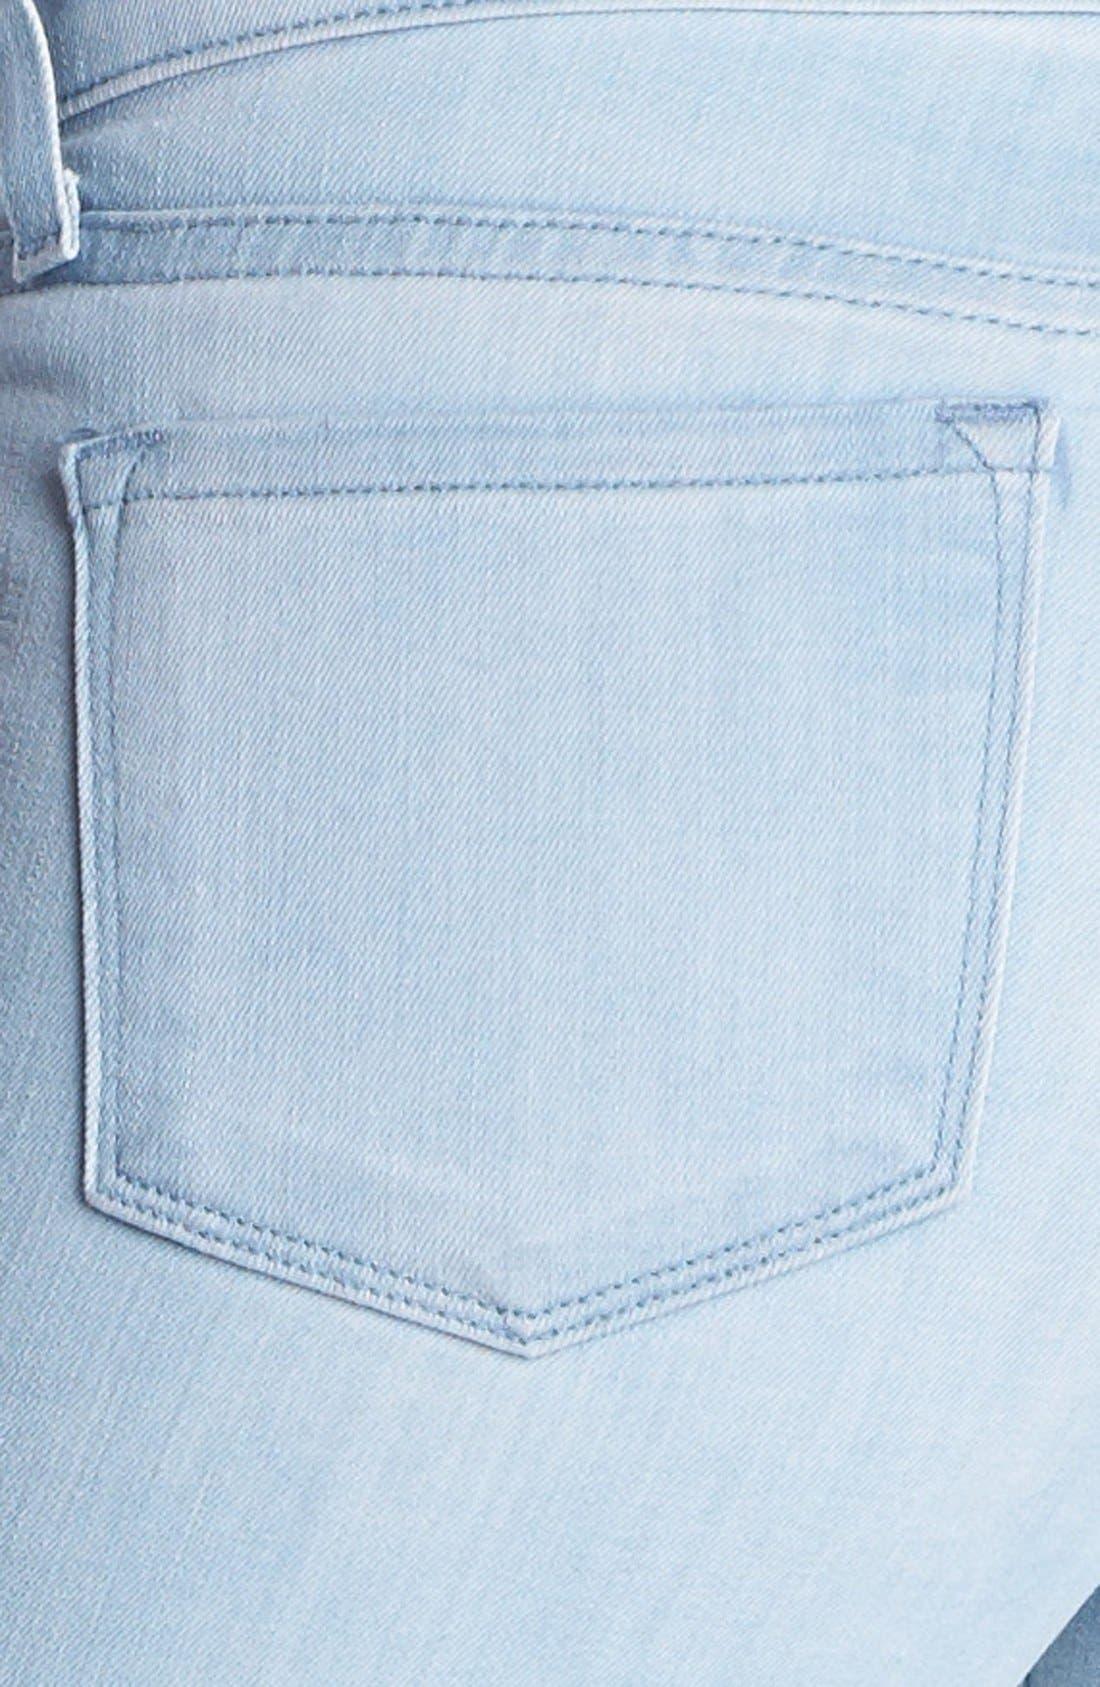 Alternate Image 3  - J Brand '811' Mid-Rise Skinny Jeans (Journey)